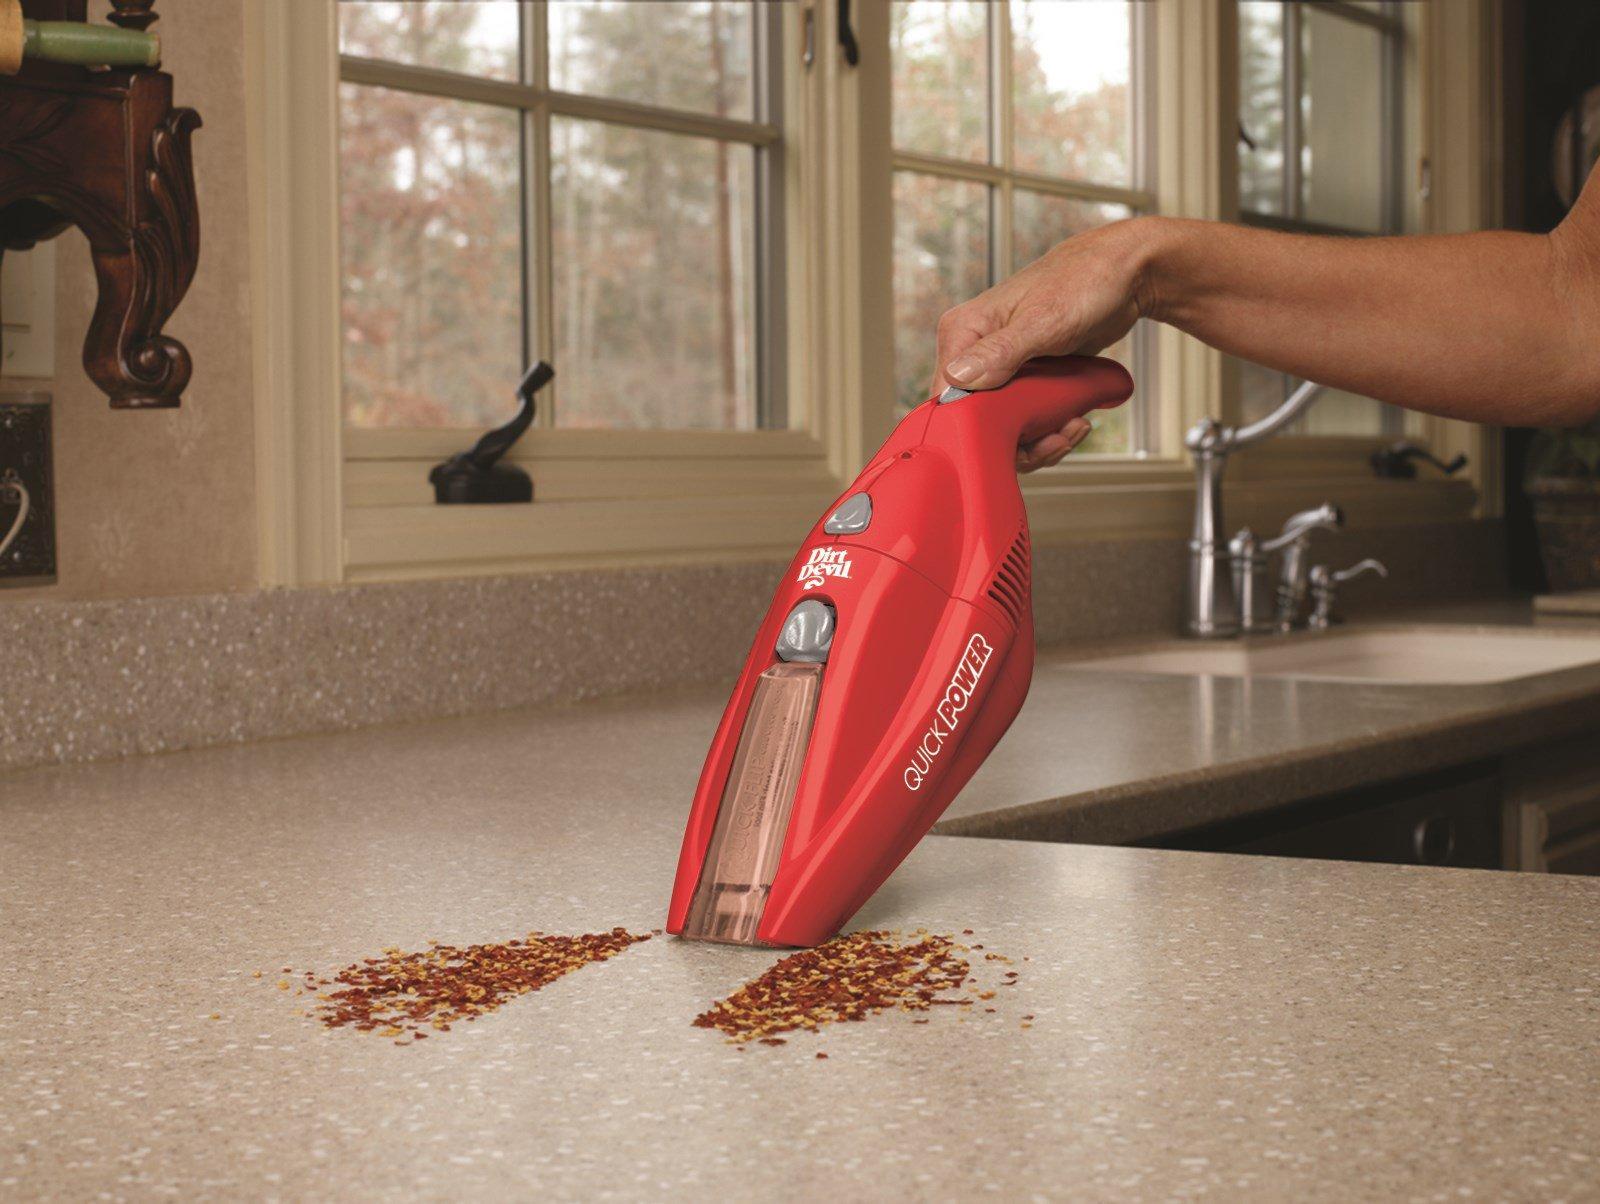 Quick Power 7.2V Cordless Hand Vacuum4